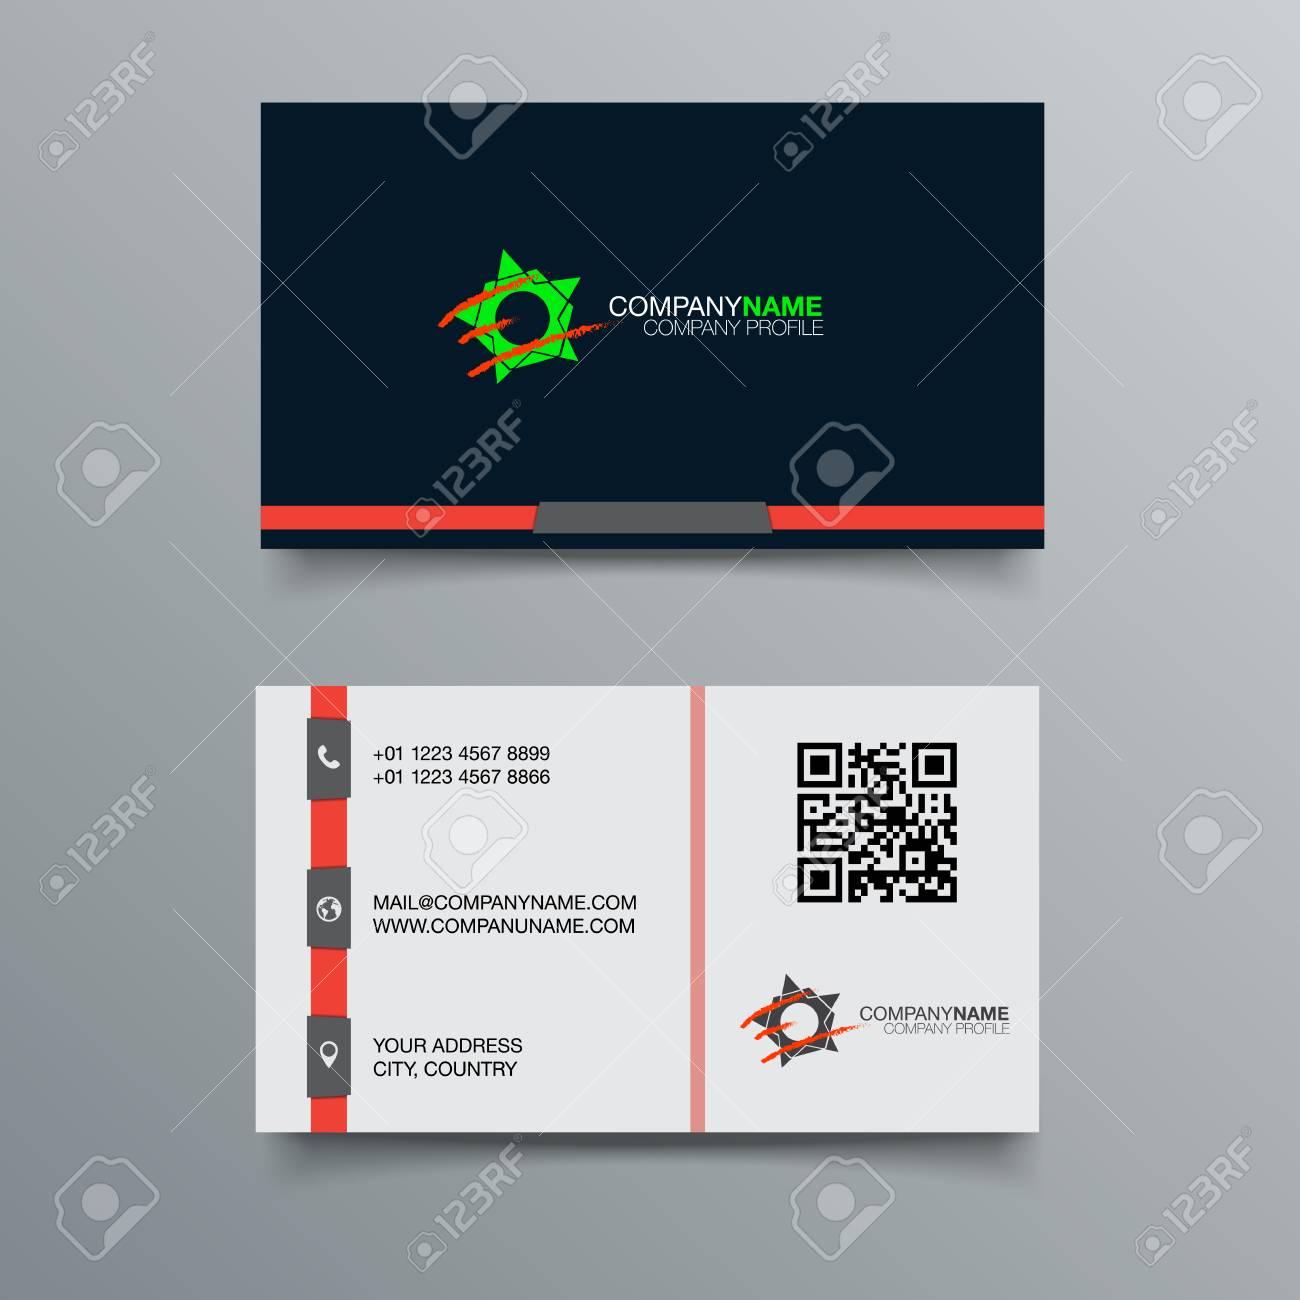 Business Card Background Design Template Stock Vector Illustration